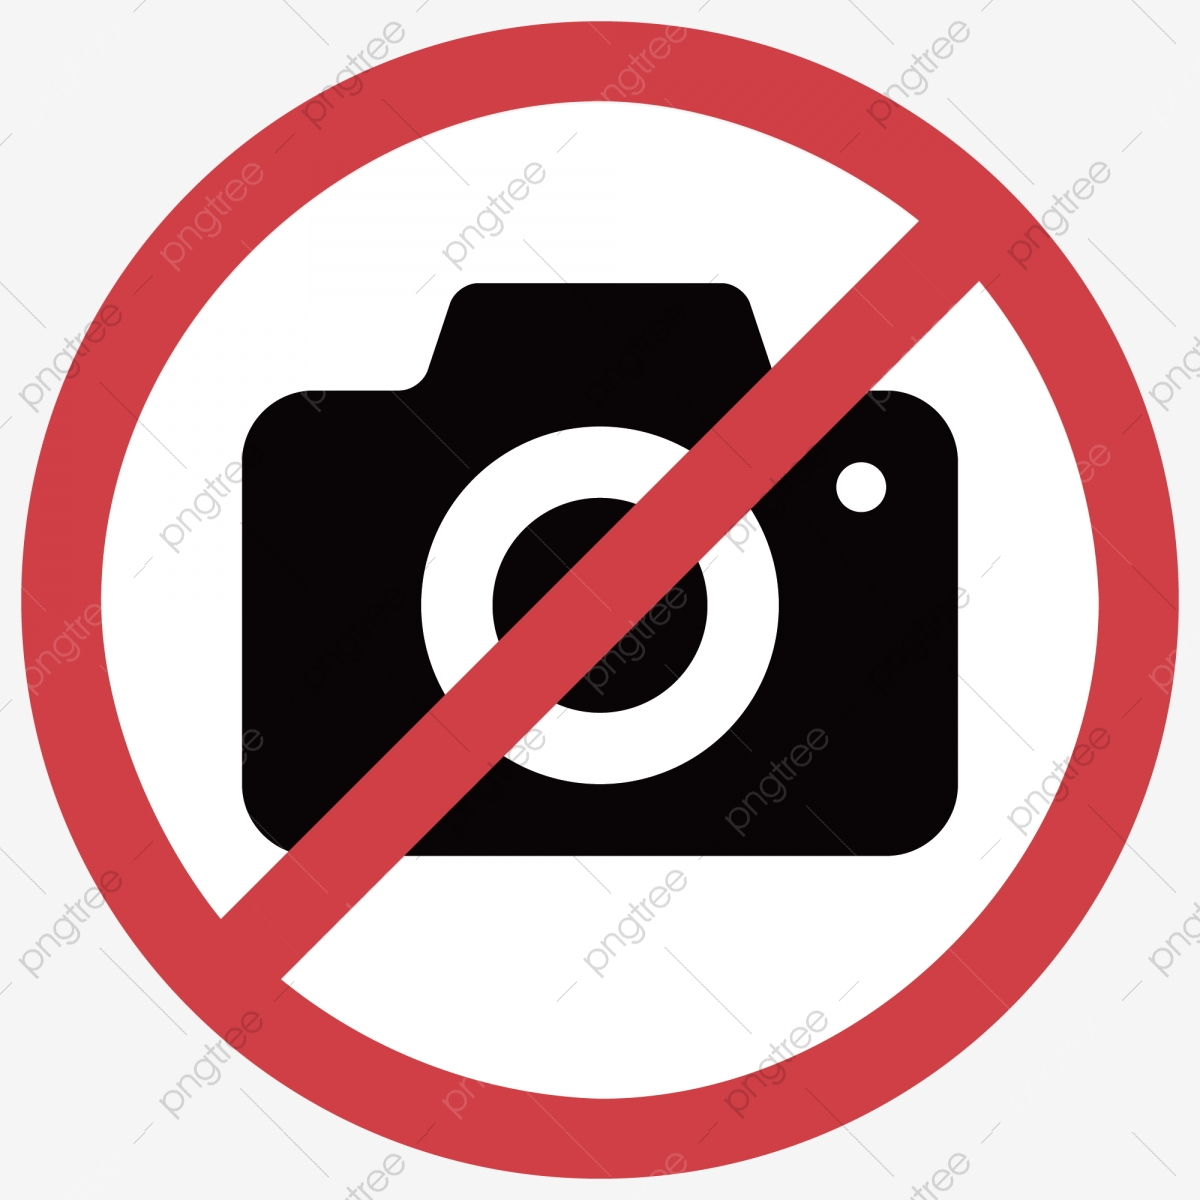 Free Camera Vector Cliparts, Download Free Clip Art, Free Clip Art on  Clipart Library